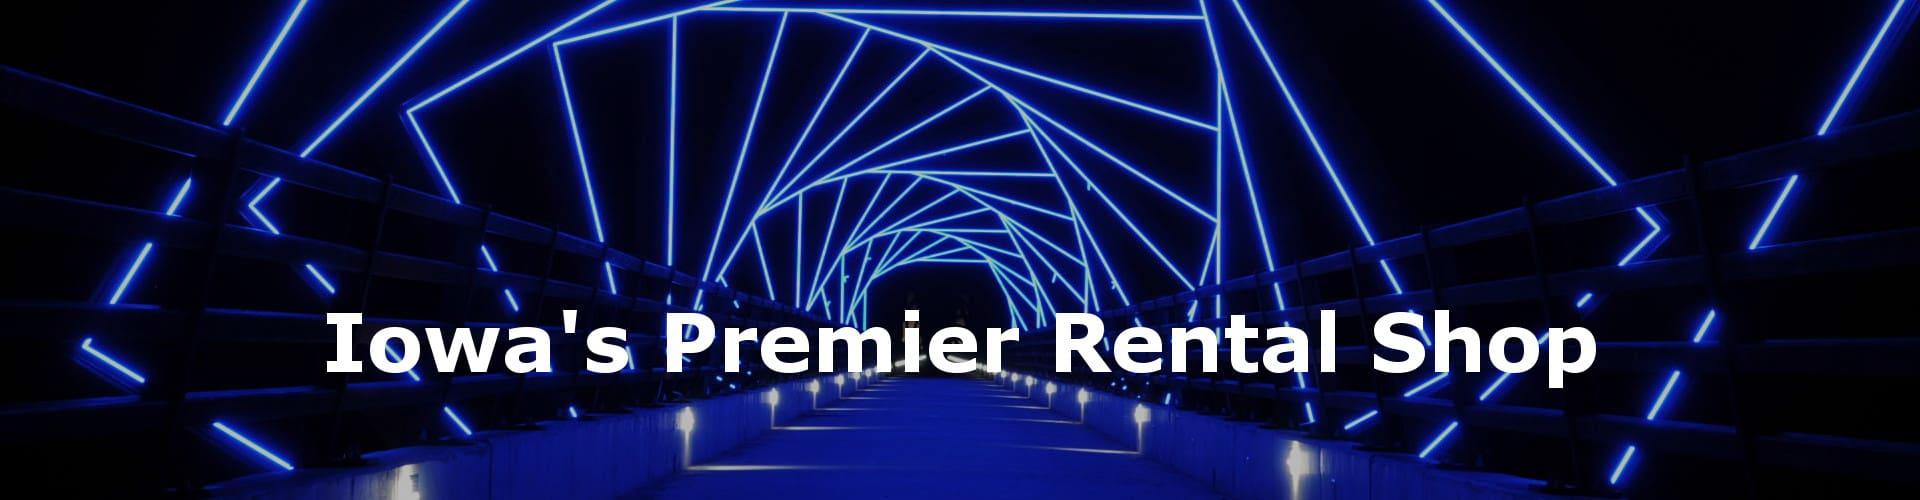 Iowa's Premier Rental Shop